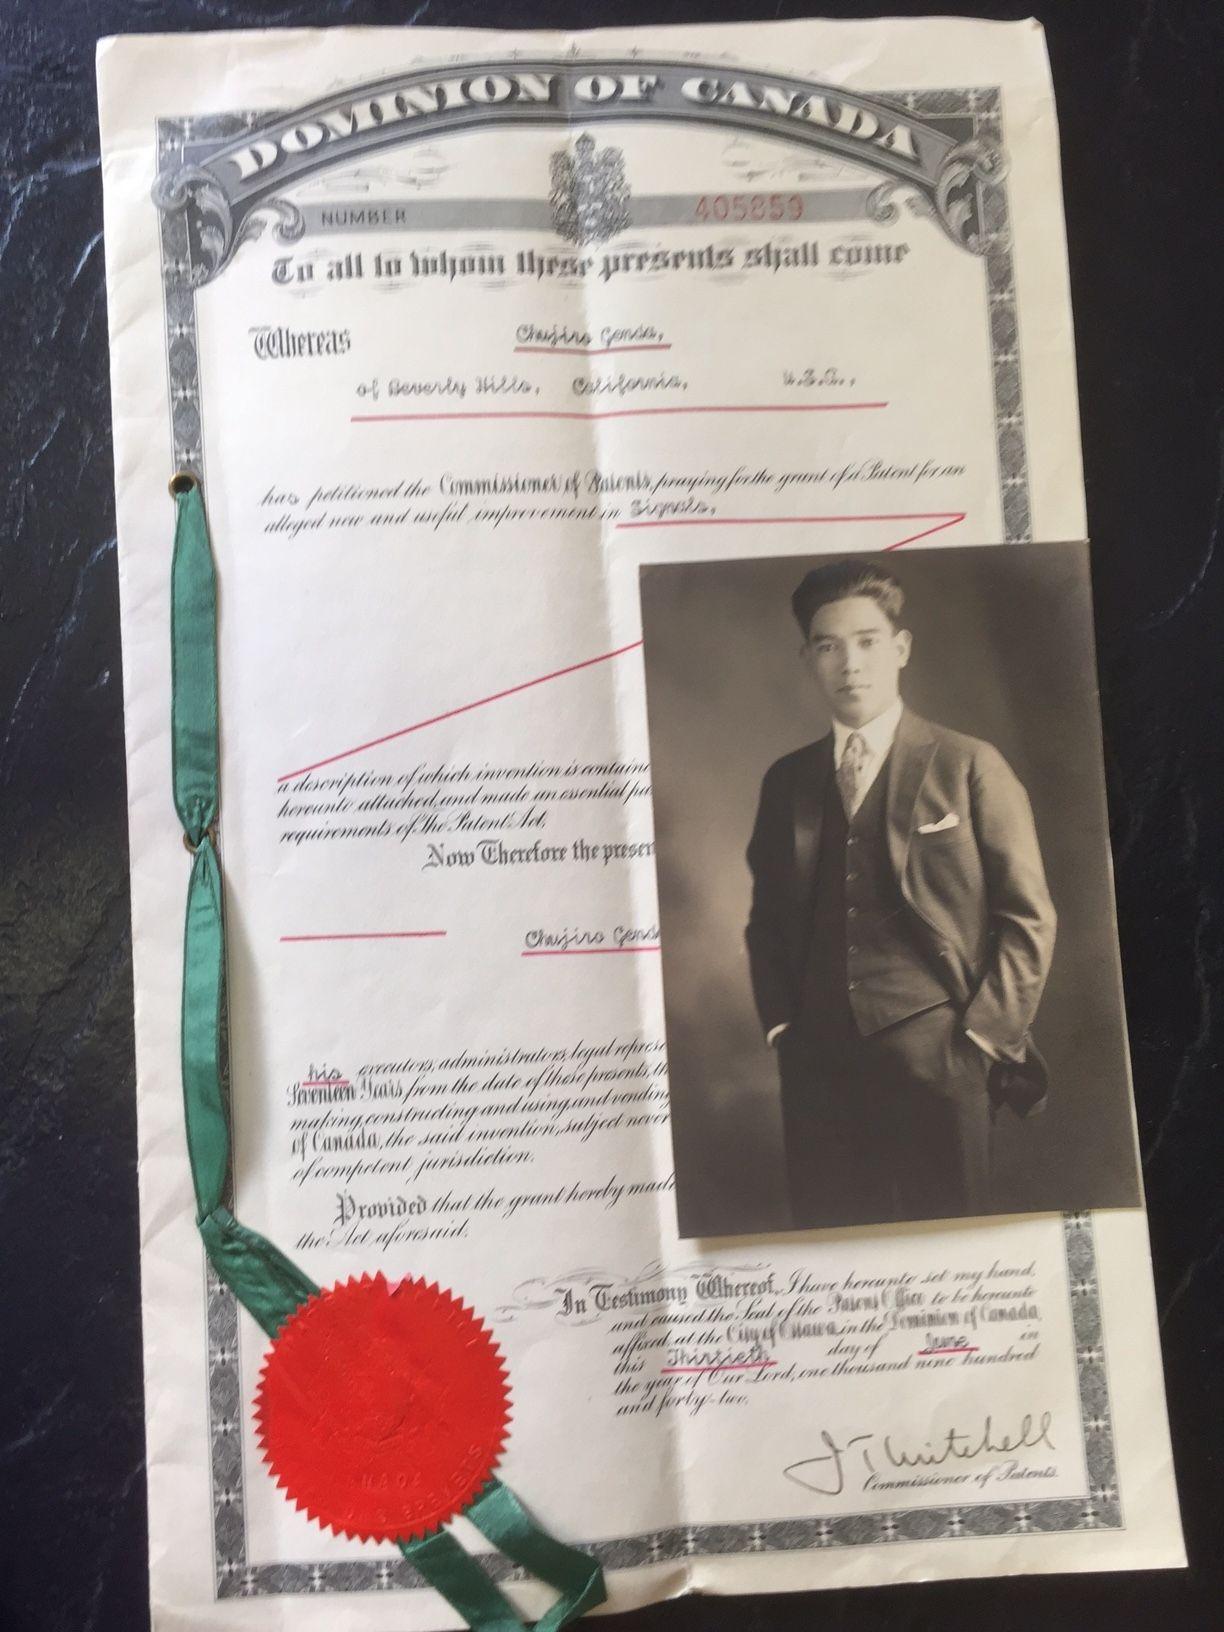 Chujiro Genda's Canadian patent for an automobile turn